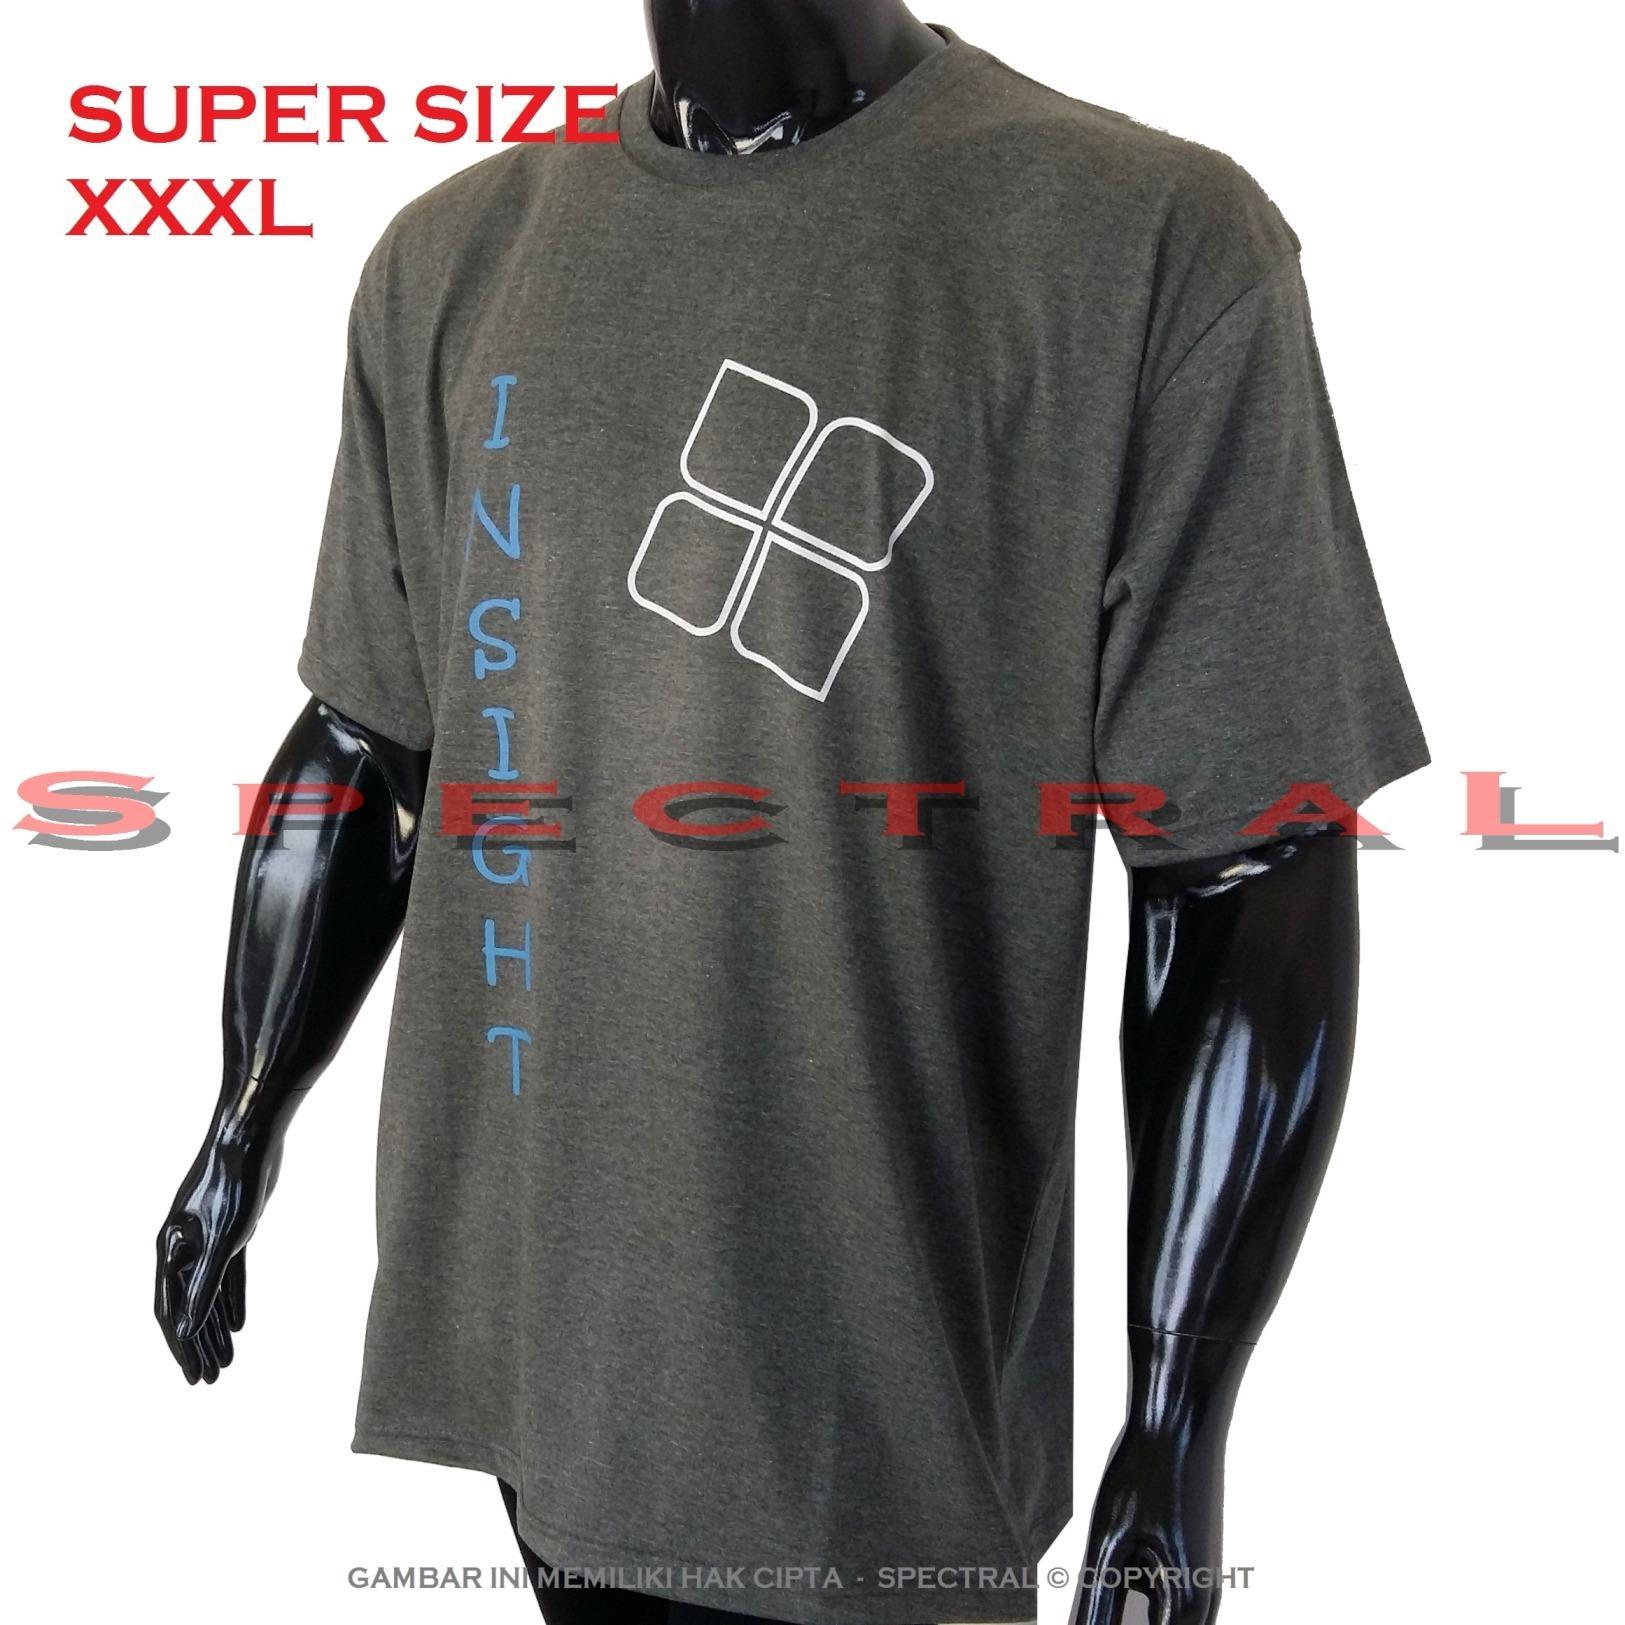 Spectral – 3XL SUPER BIG SIZE XXXL 100{55e037da9a70d2f692182bf73e9ad7c46940d20c7297ef2687c837f7bdb7b002} Cotton Combed Kaos Distro Jumbo BIGSIZE T-Shirt Fashion Ukuran Besar Polos Celana Atasan Pria Wanita Katun Bapak Orang Tua Gemuk Gendut Simple Sport Casual Halus Baju Cowo Cewe Pakaian Super Size 3L INSIGHT 4 ABUTUA